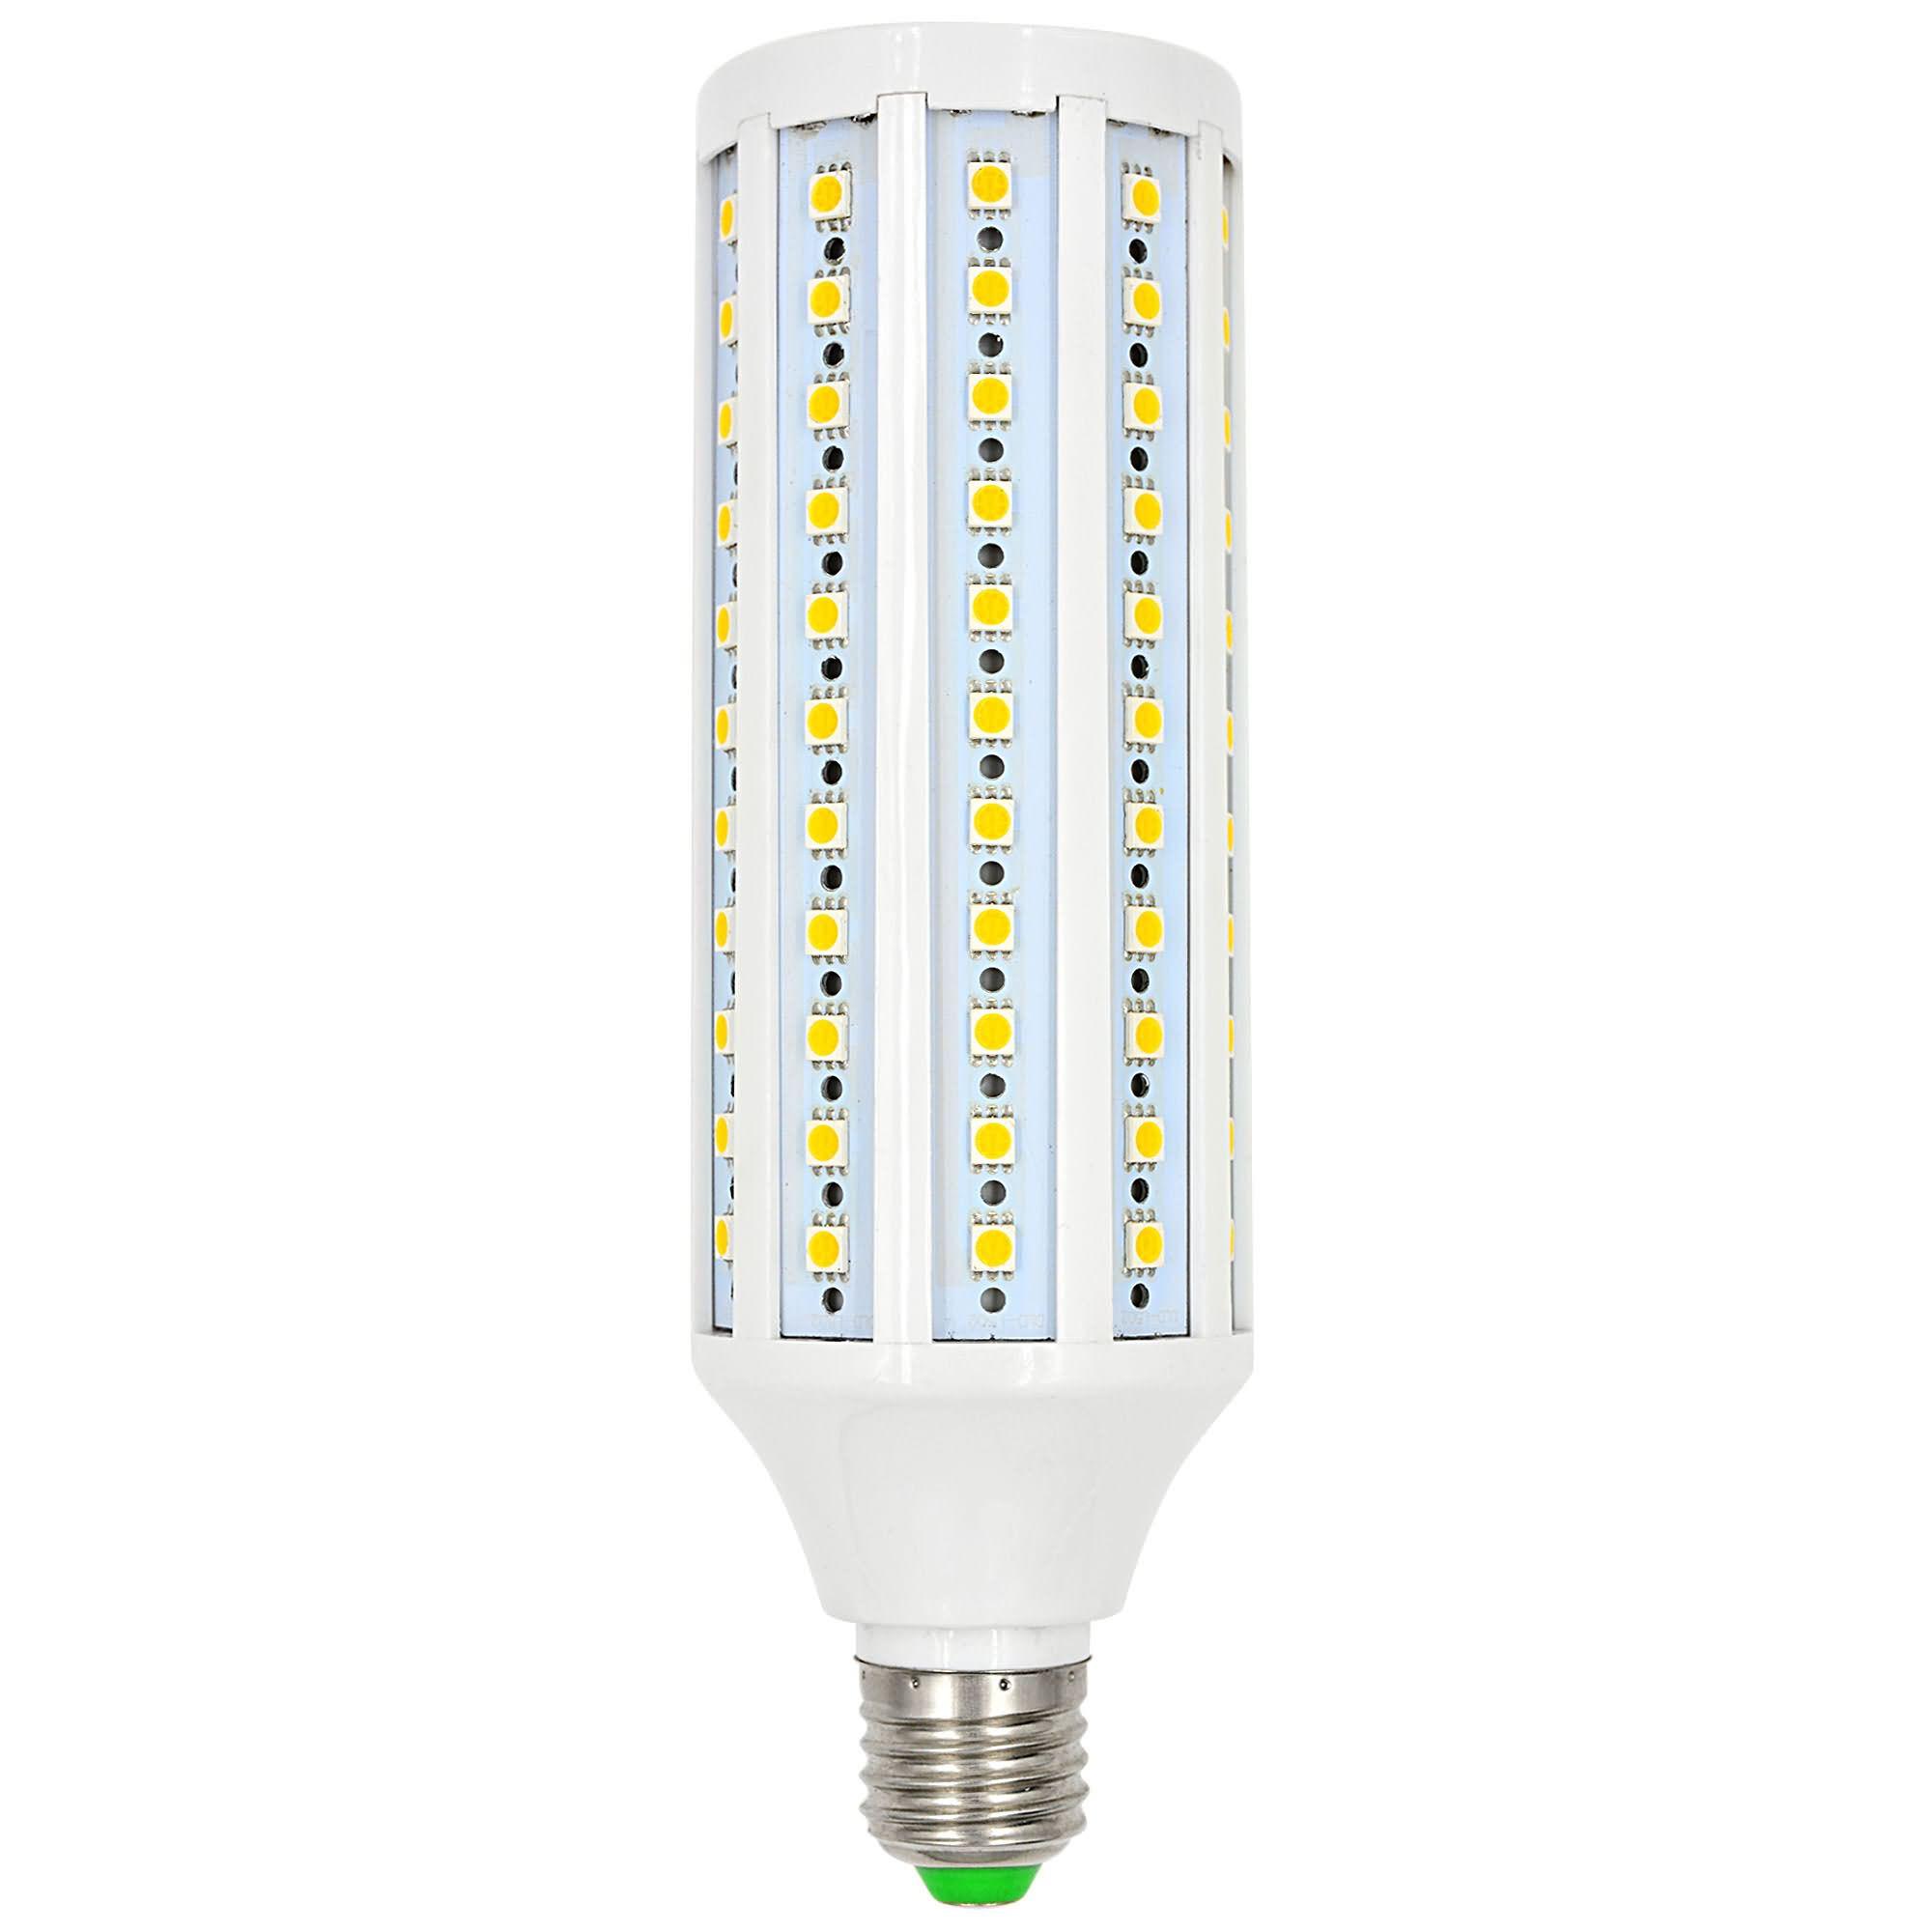 MENGS® E27 21W LED Corn Light 132x 5050 SMD LEDs LED Bulb In Warm White Energy-Saving Lamp